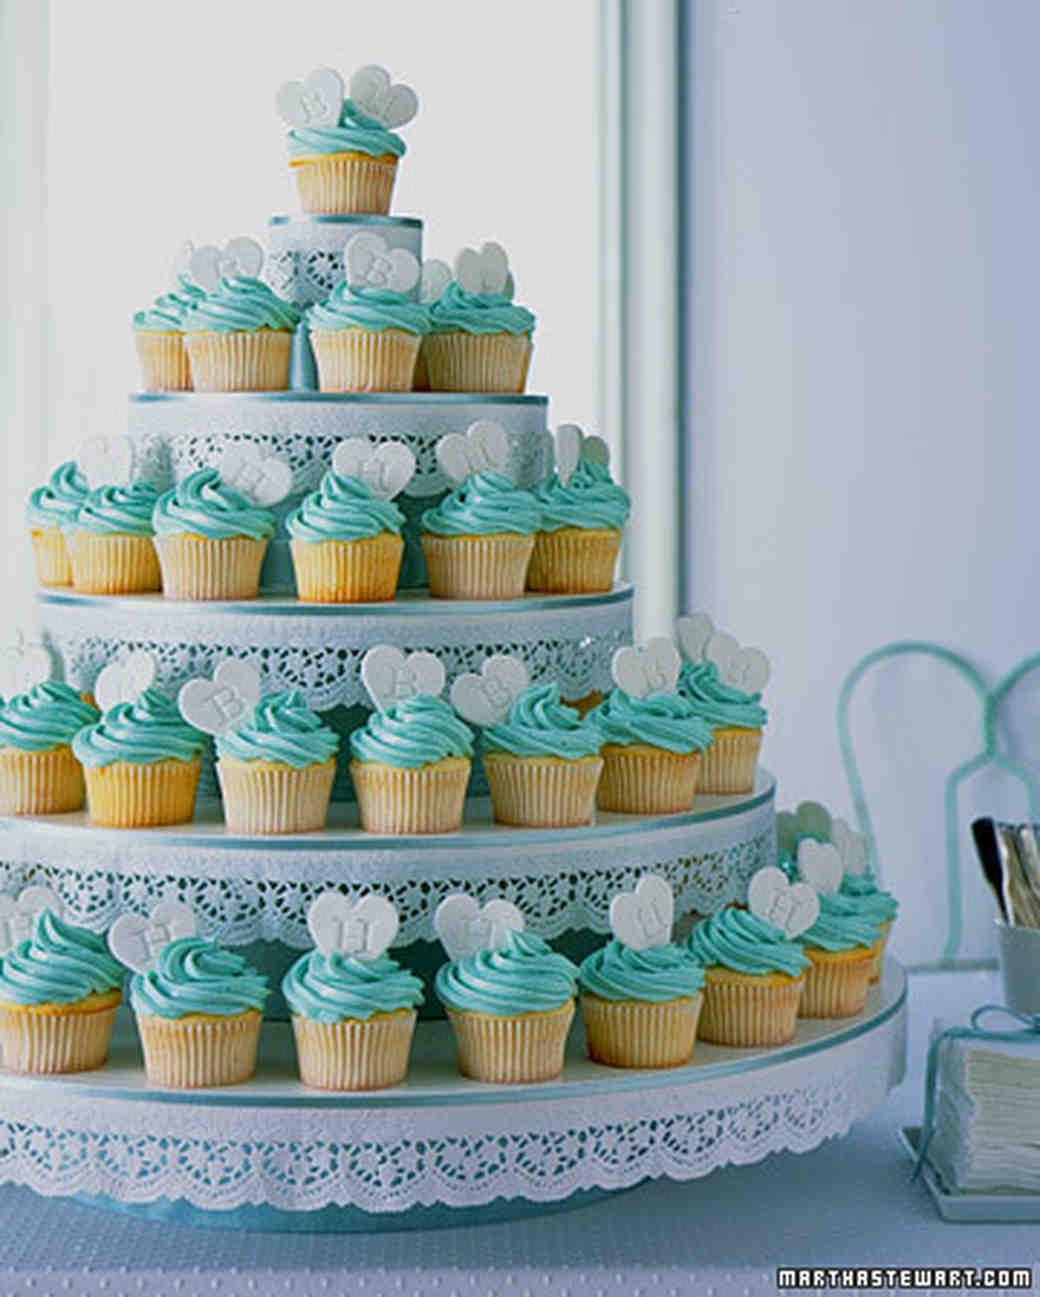 a99769_win03_cupcakes.jpg